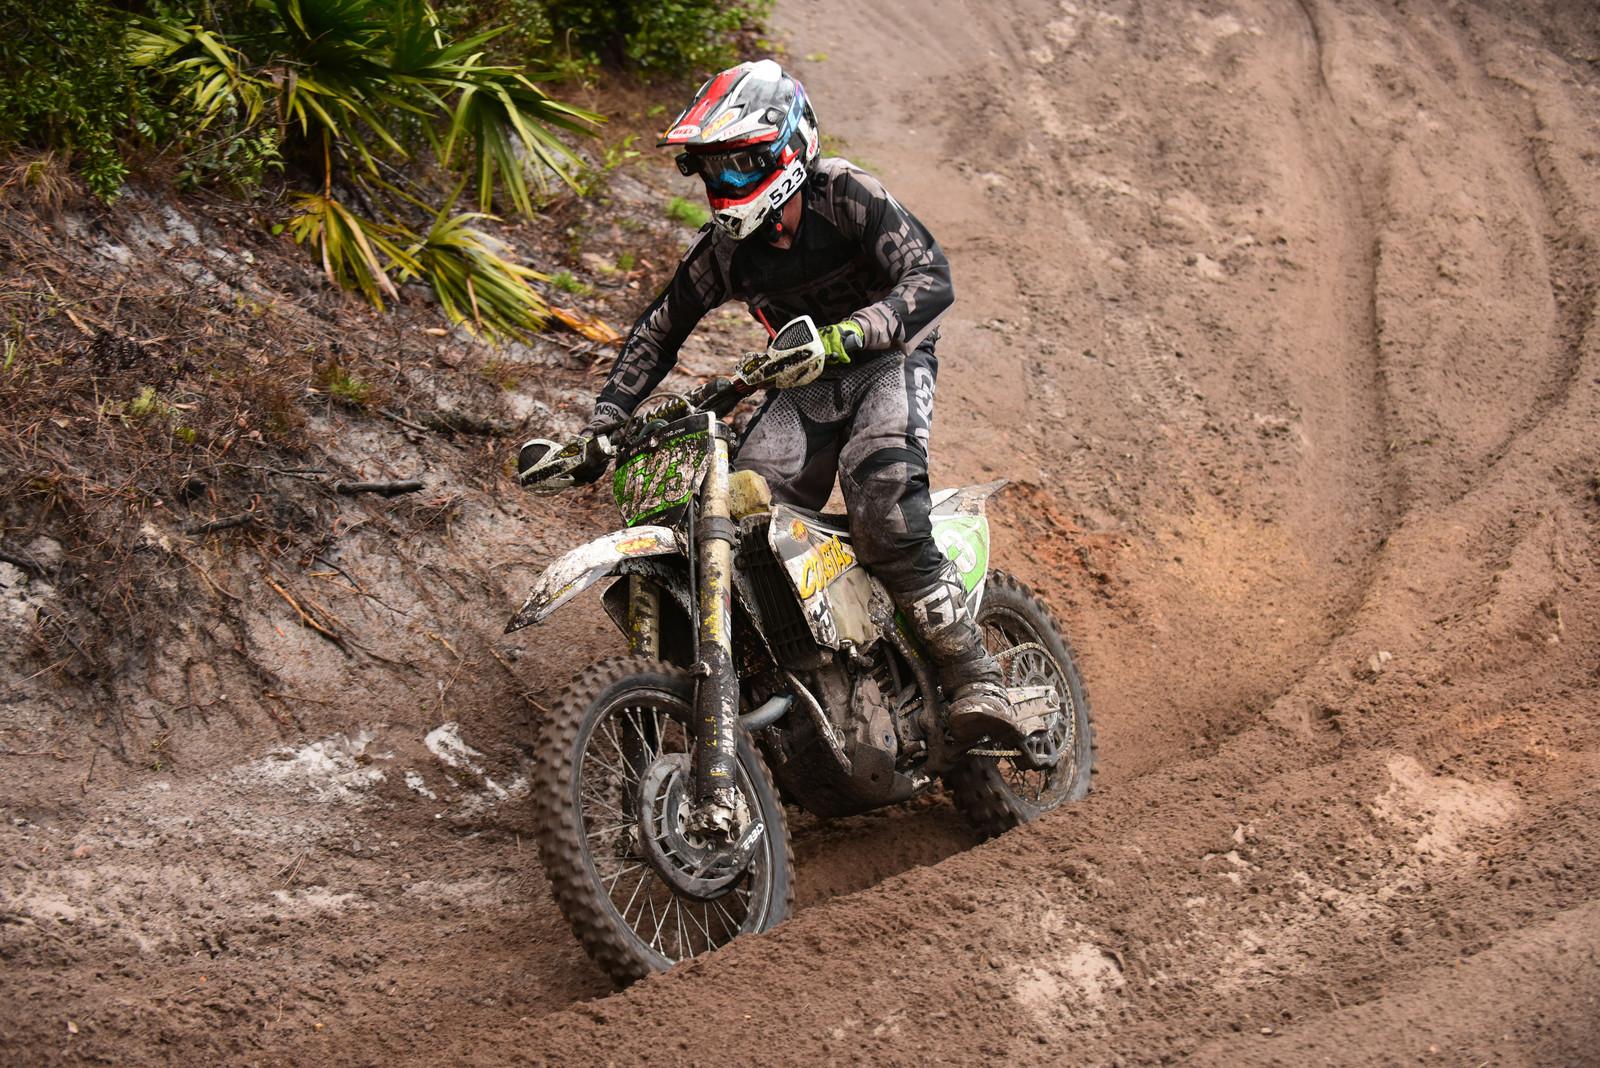 Layne Michael - Wild Boar GNCC - Motocross Pictures - Vital MX